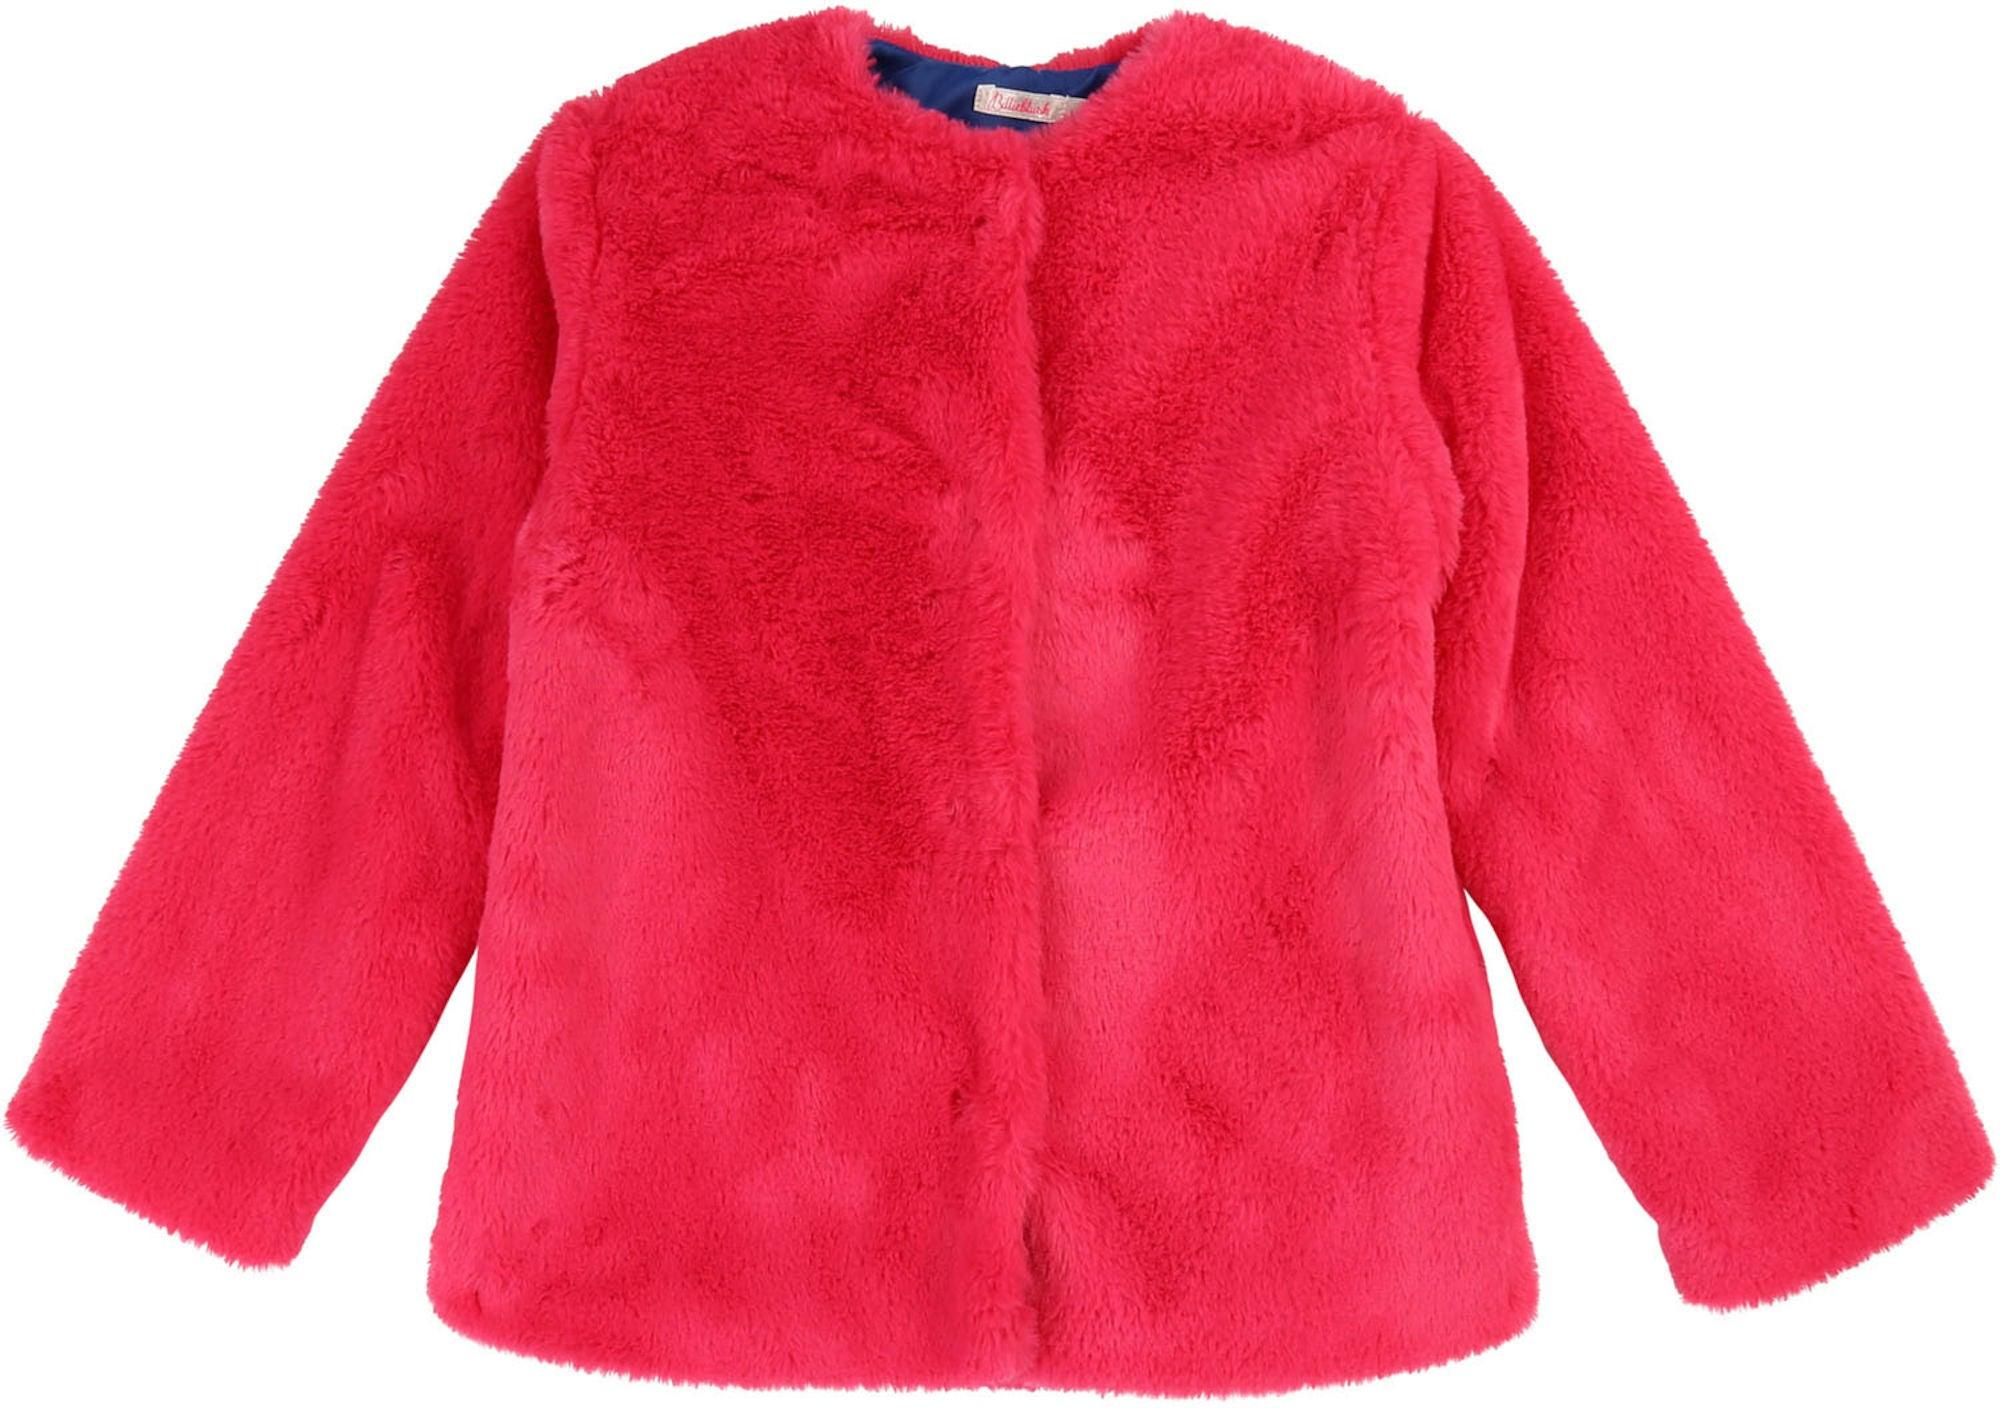 Billieblush Fake Fur Jacka, Cranberries 3 år